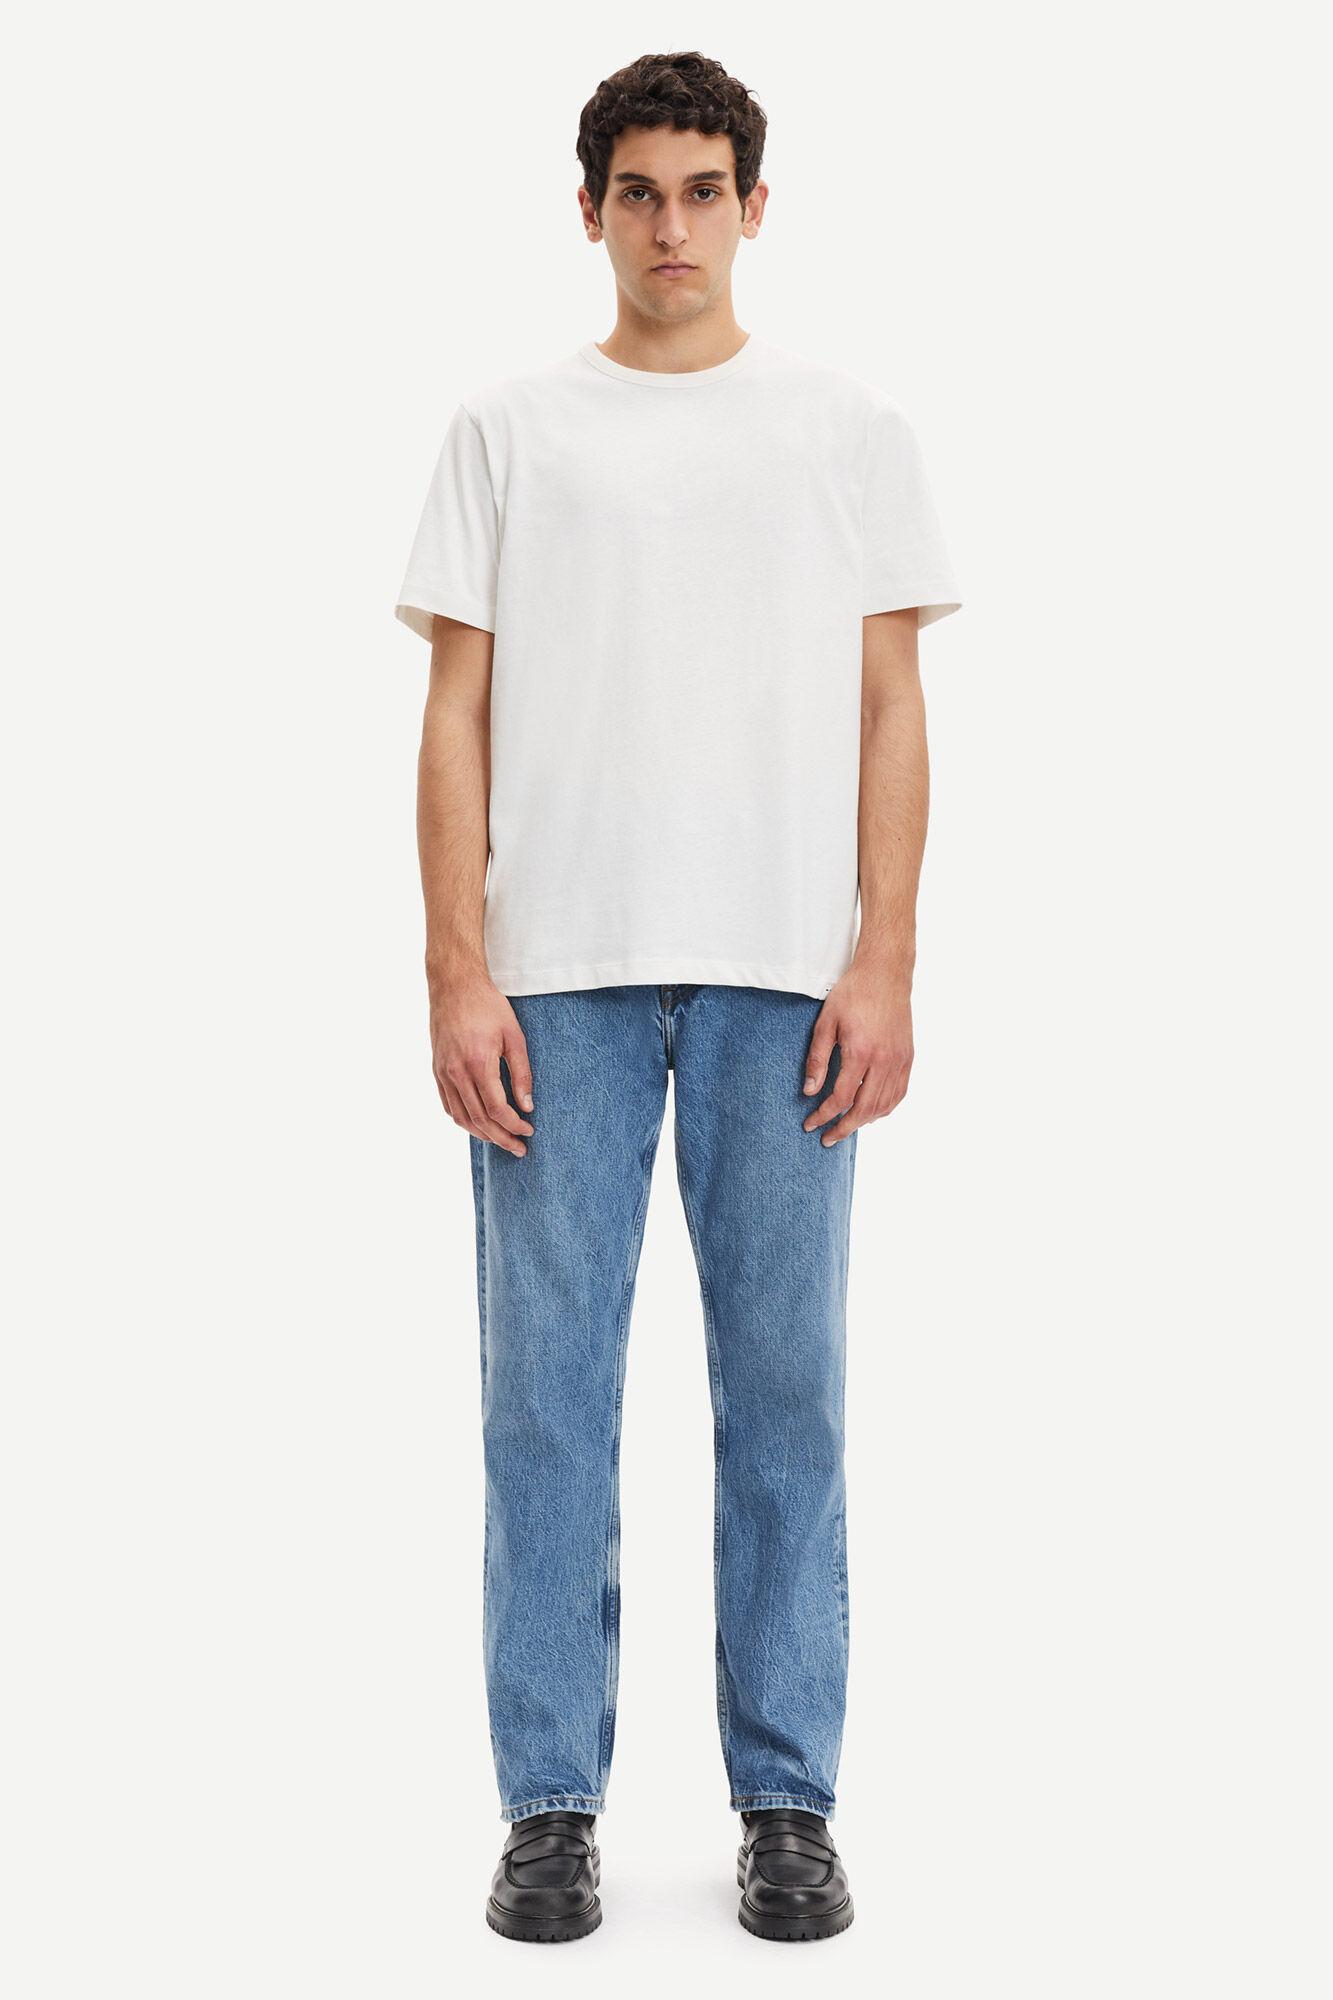 Hugo t-shirt 11415, LILY WHITE